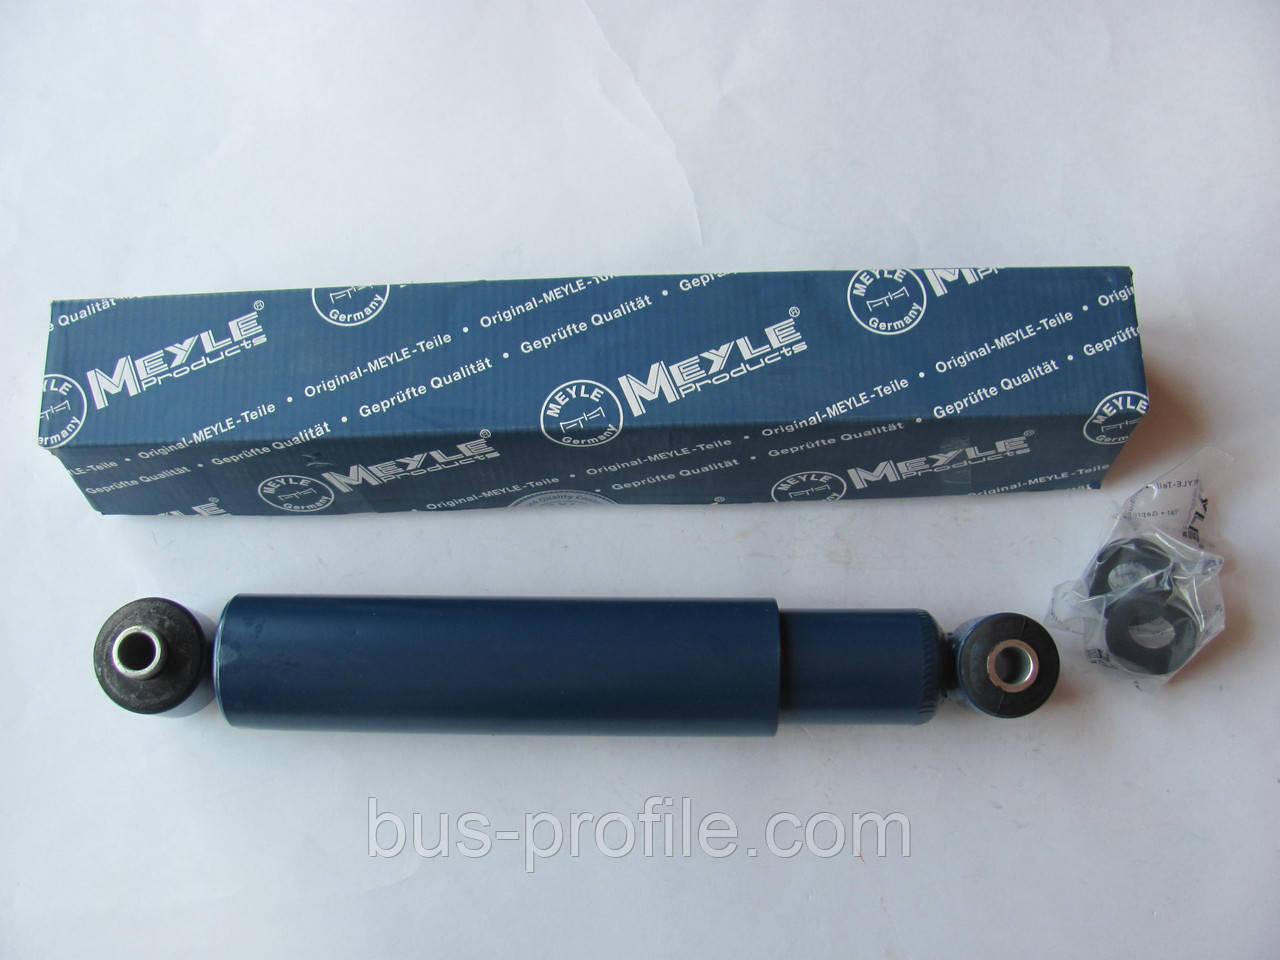 Амортизатор задний (масляный) на MB Sprinter 904 (Спарка), VW LT-46 1996-2006 — Meyle — 0267150005